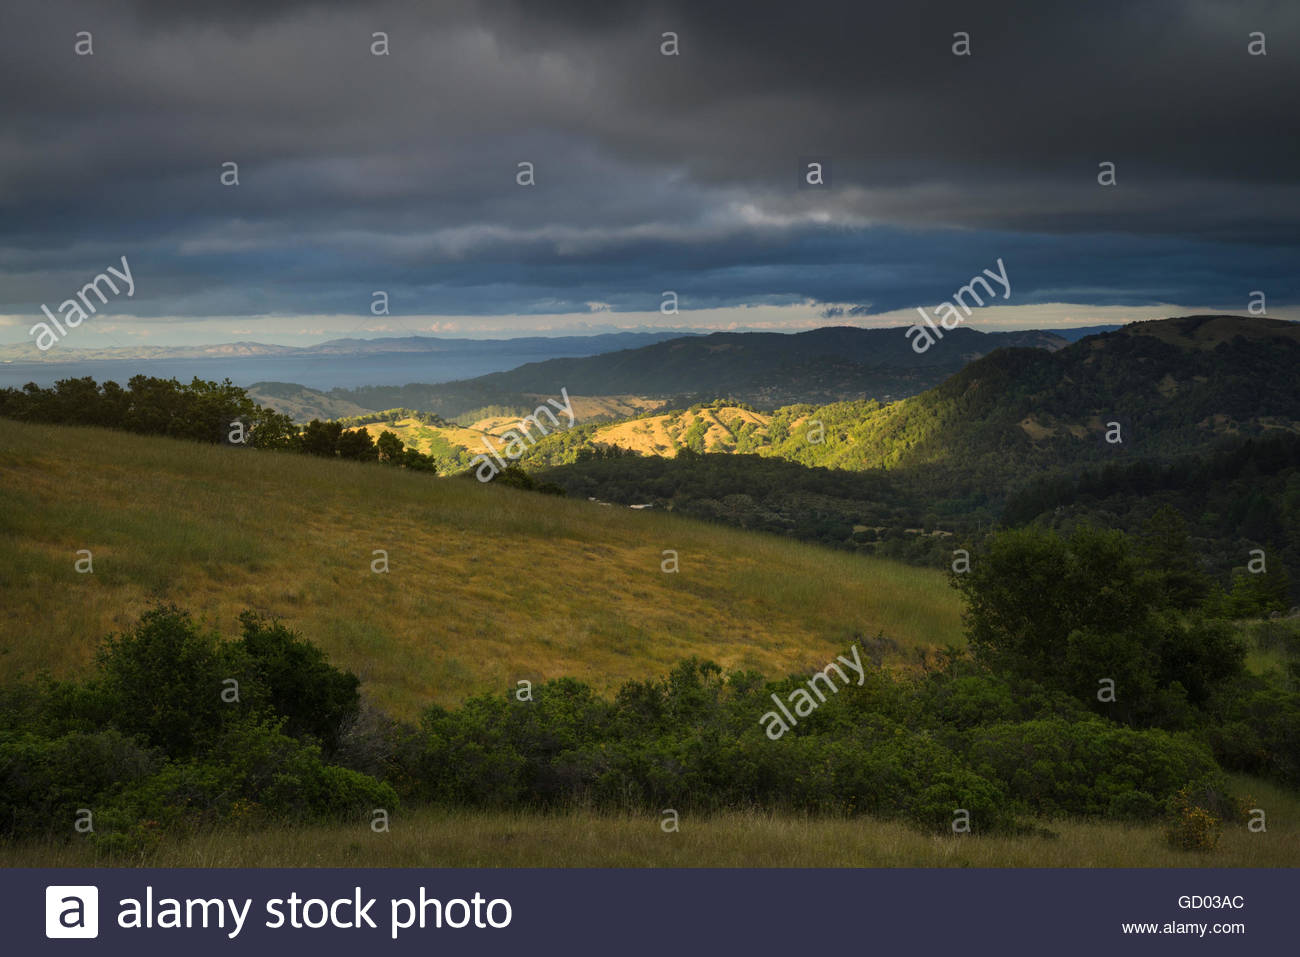 Sunset Light in Mount Tamalpais Watershed, Marin County, California - Stock Image